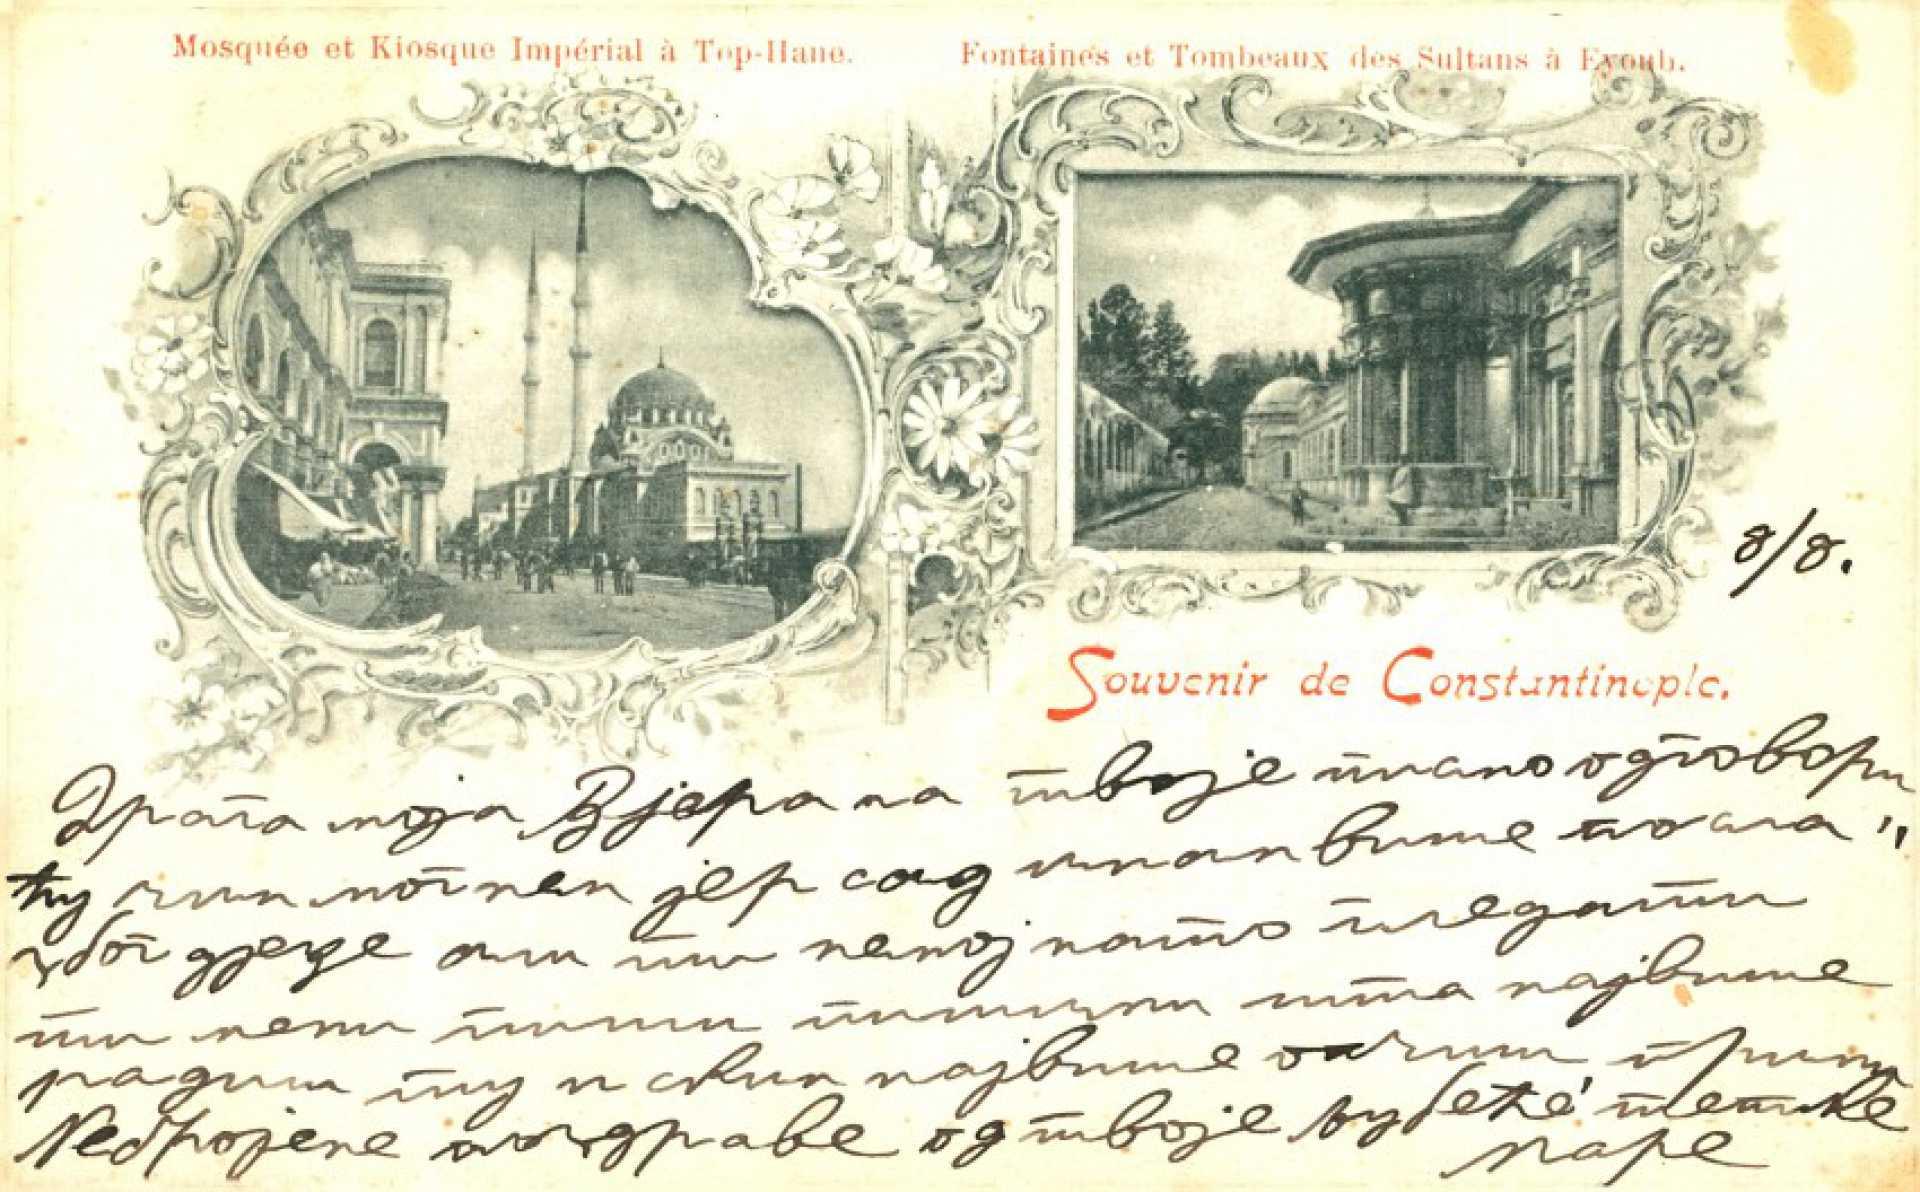 Mosquee et Kiosque Imperial a Top-hane